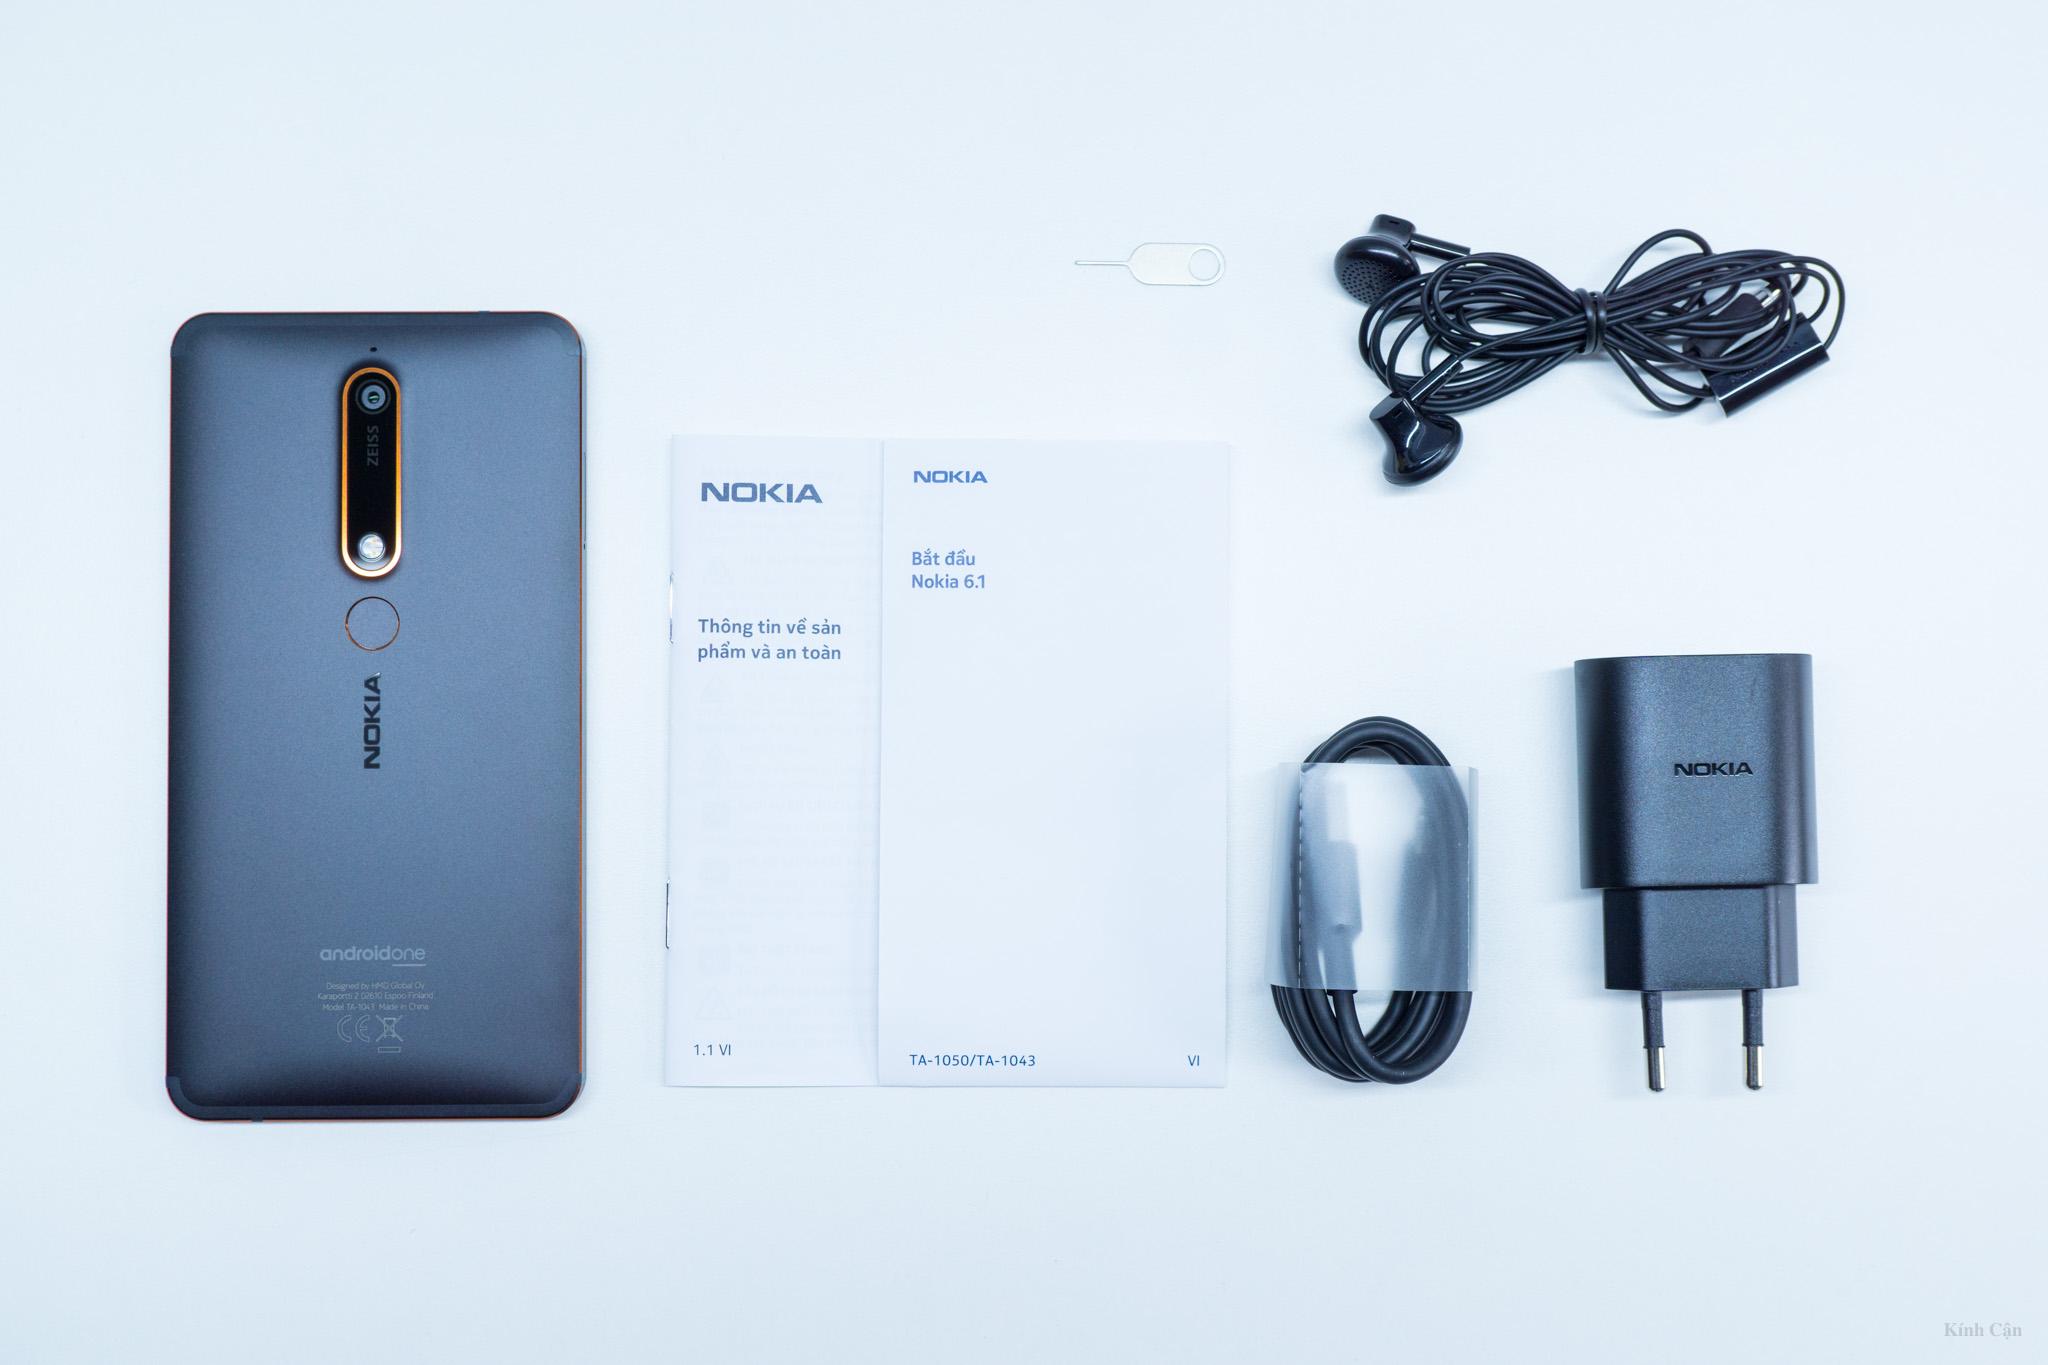 Nokia 6 mới_-6.jpg